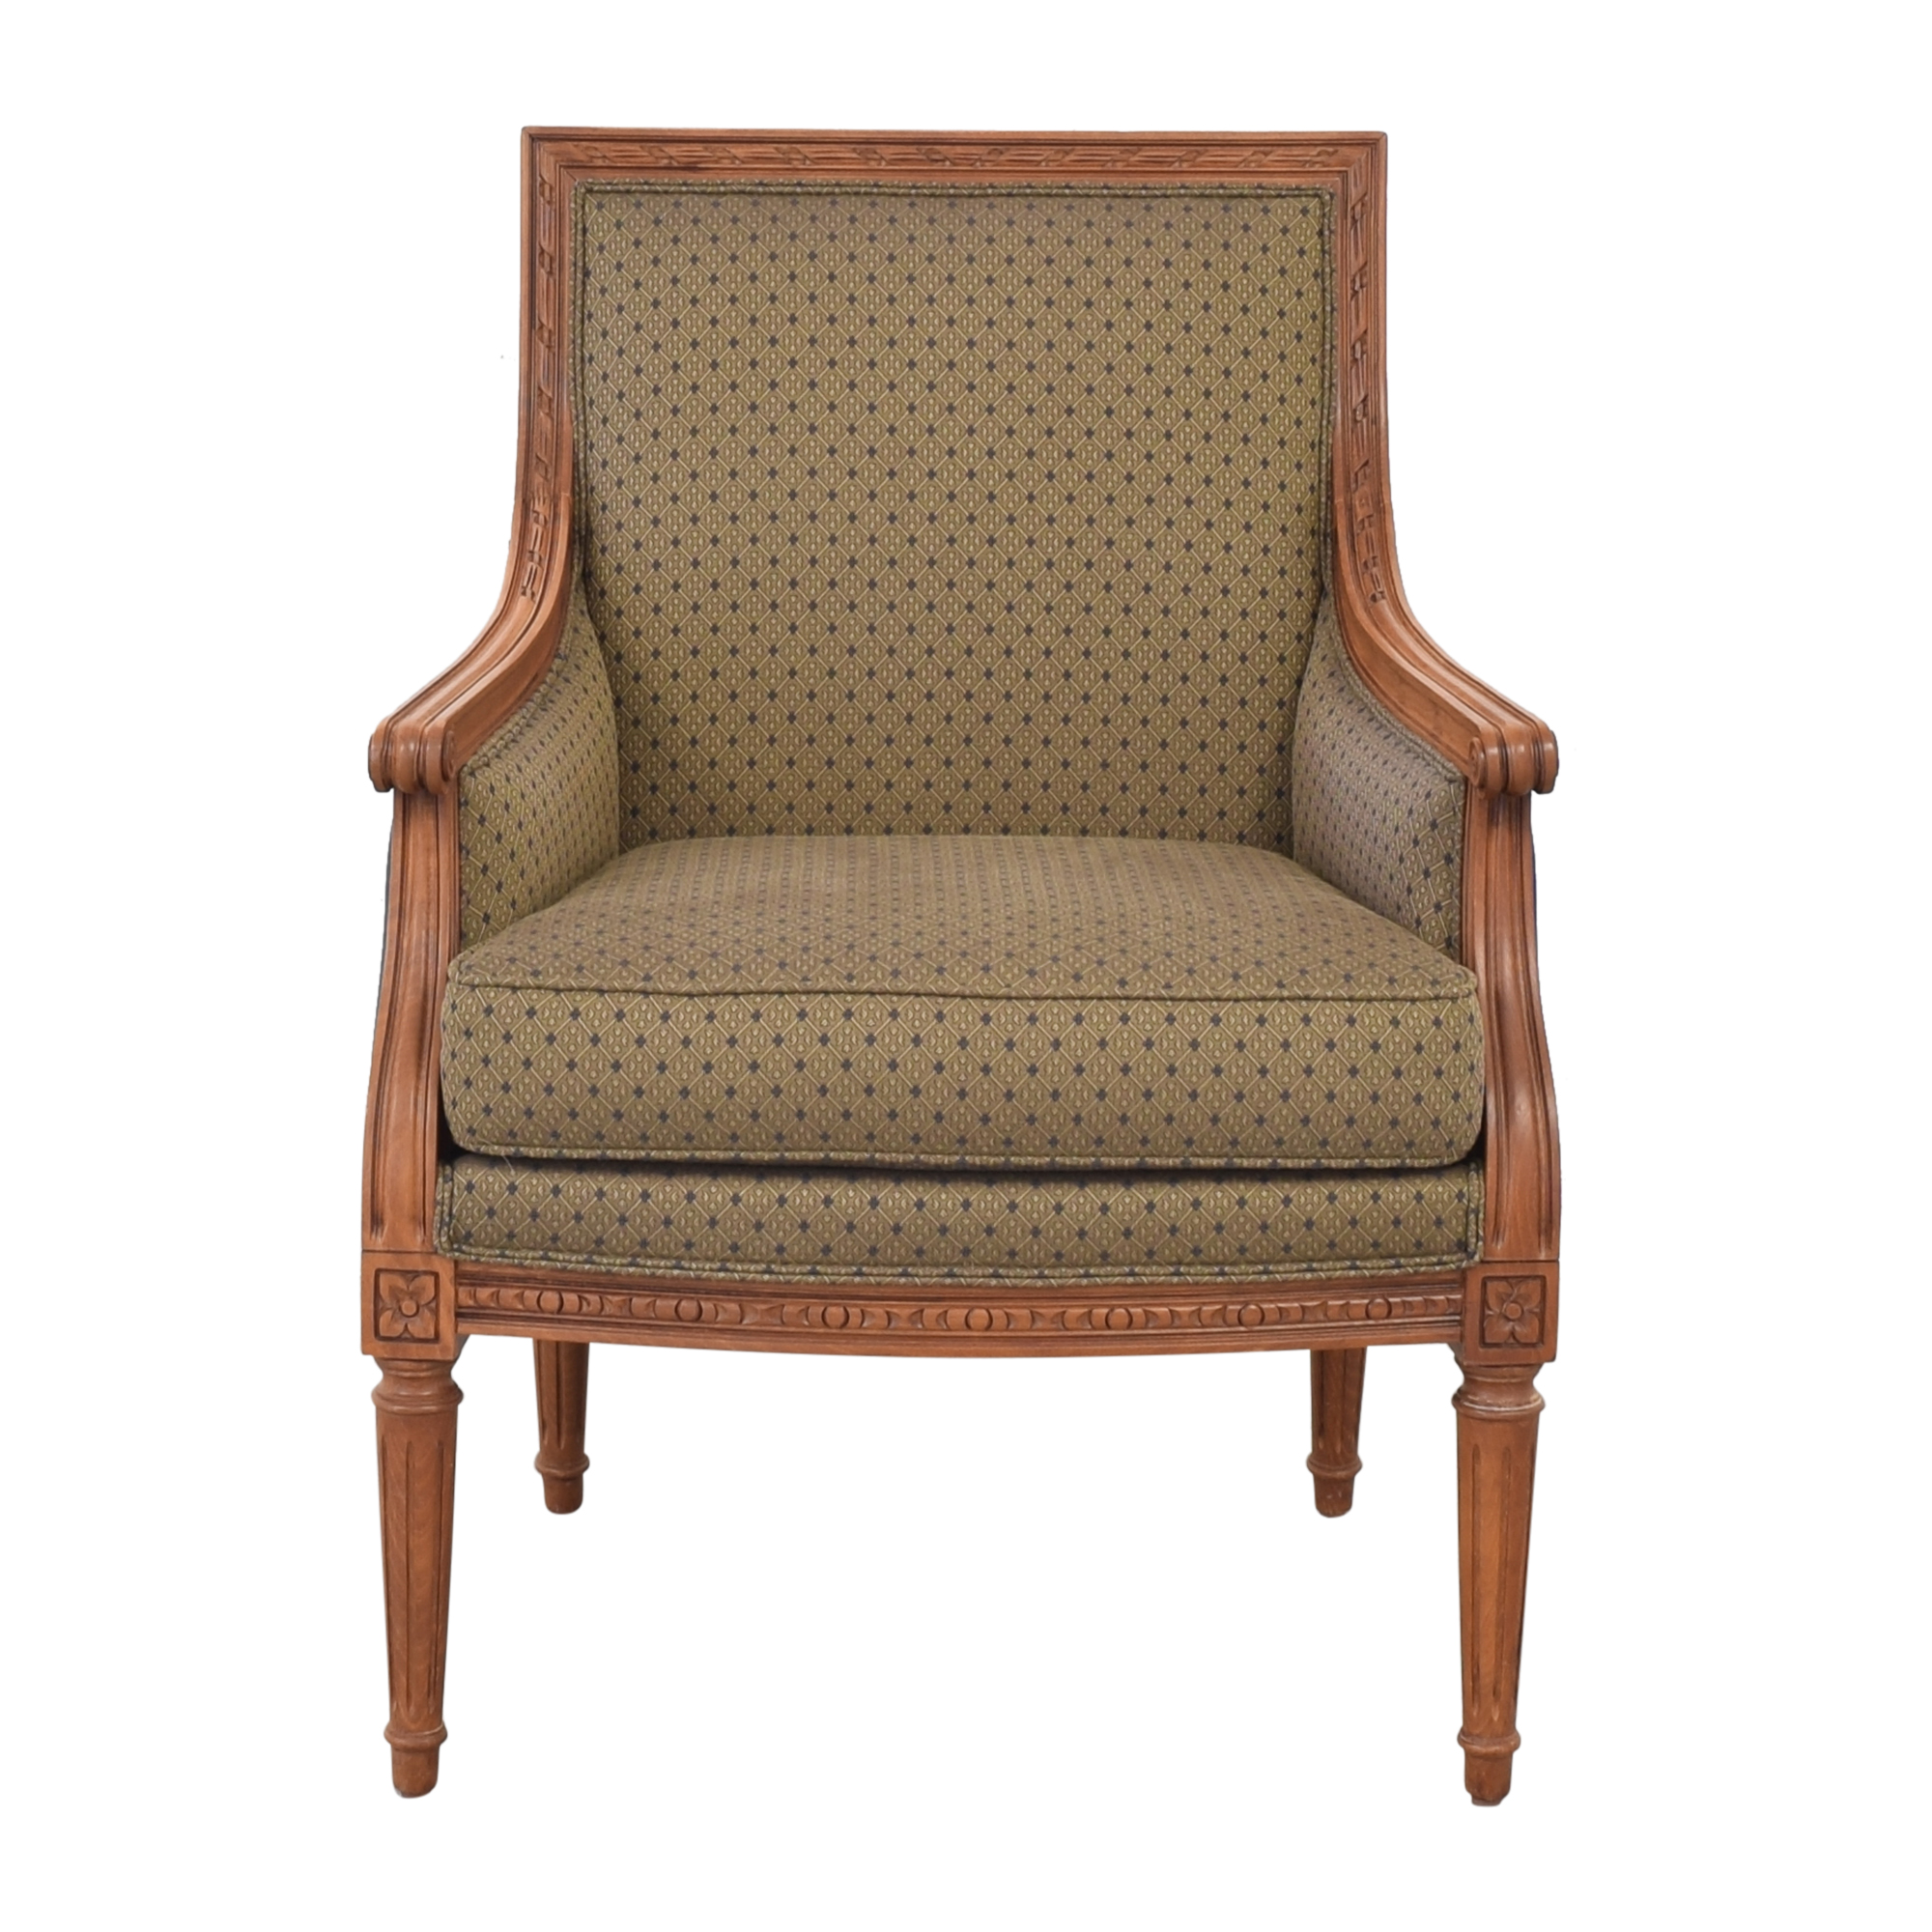 Ethan Allen Ethan Allen Gisele Chair ct